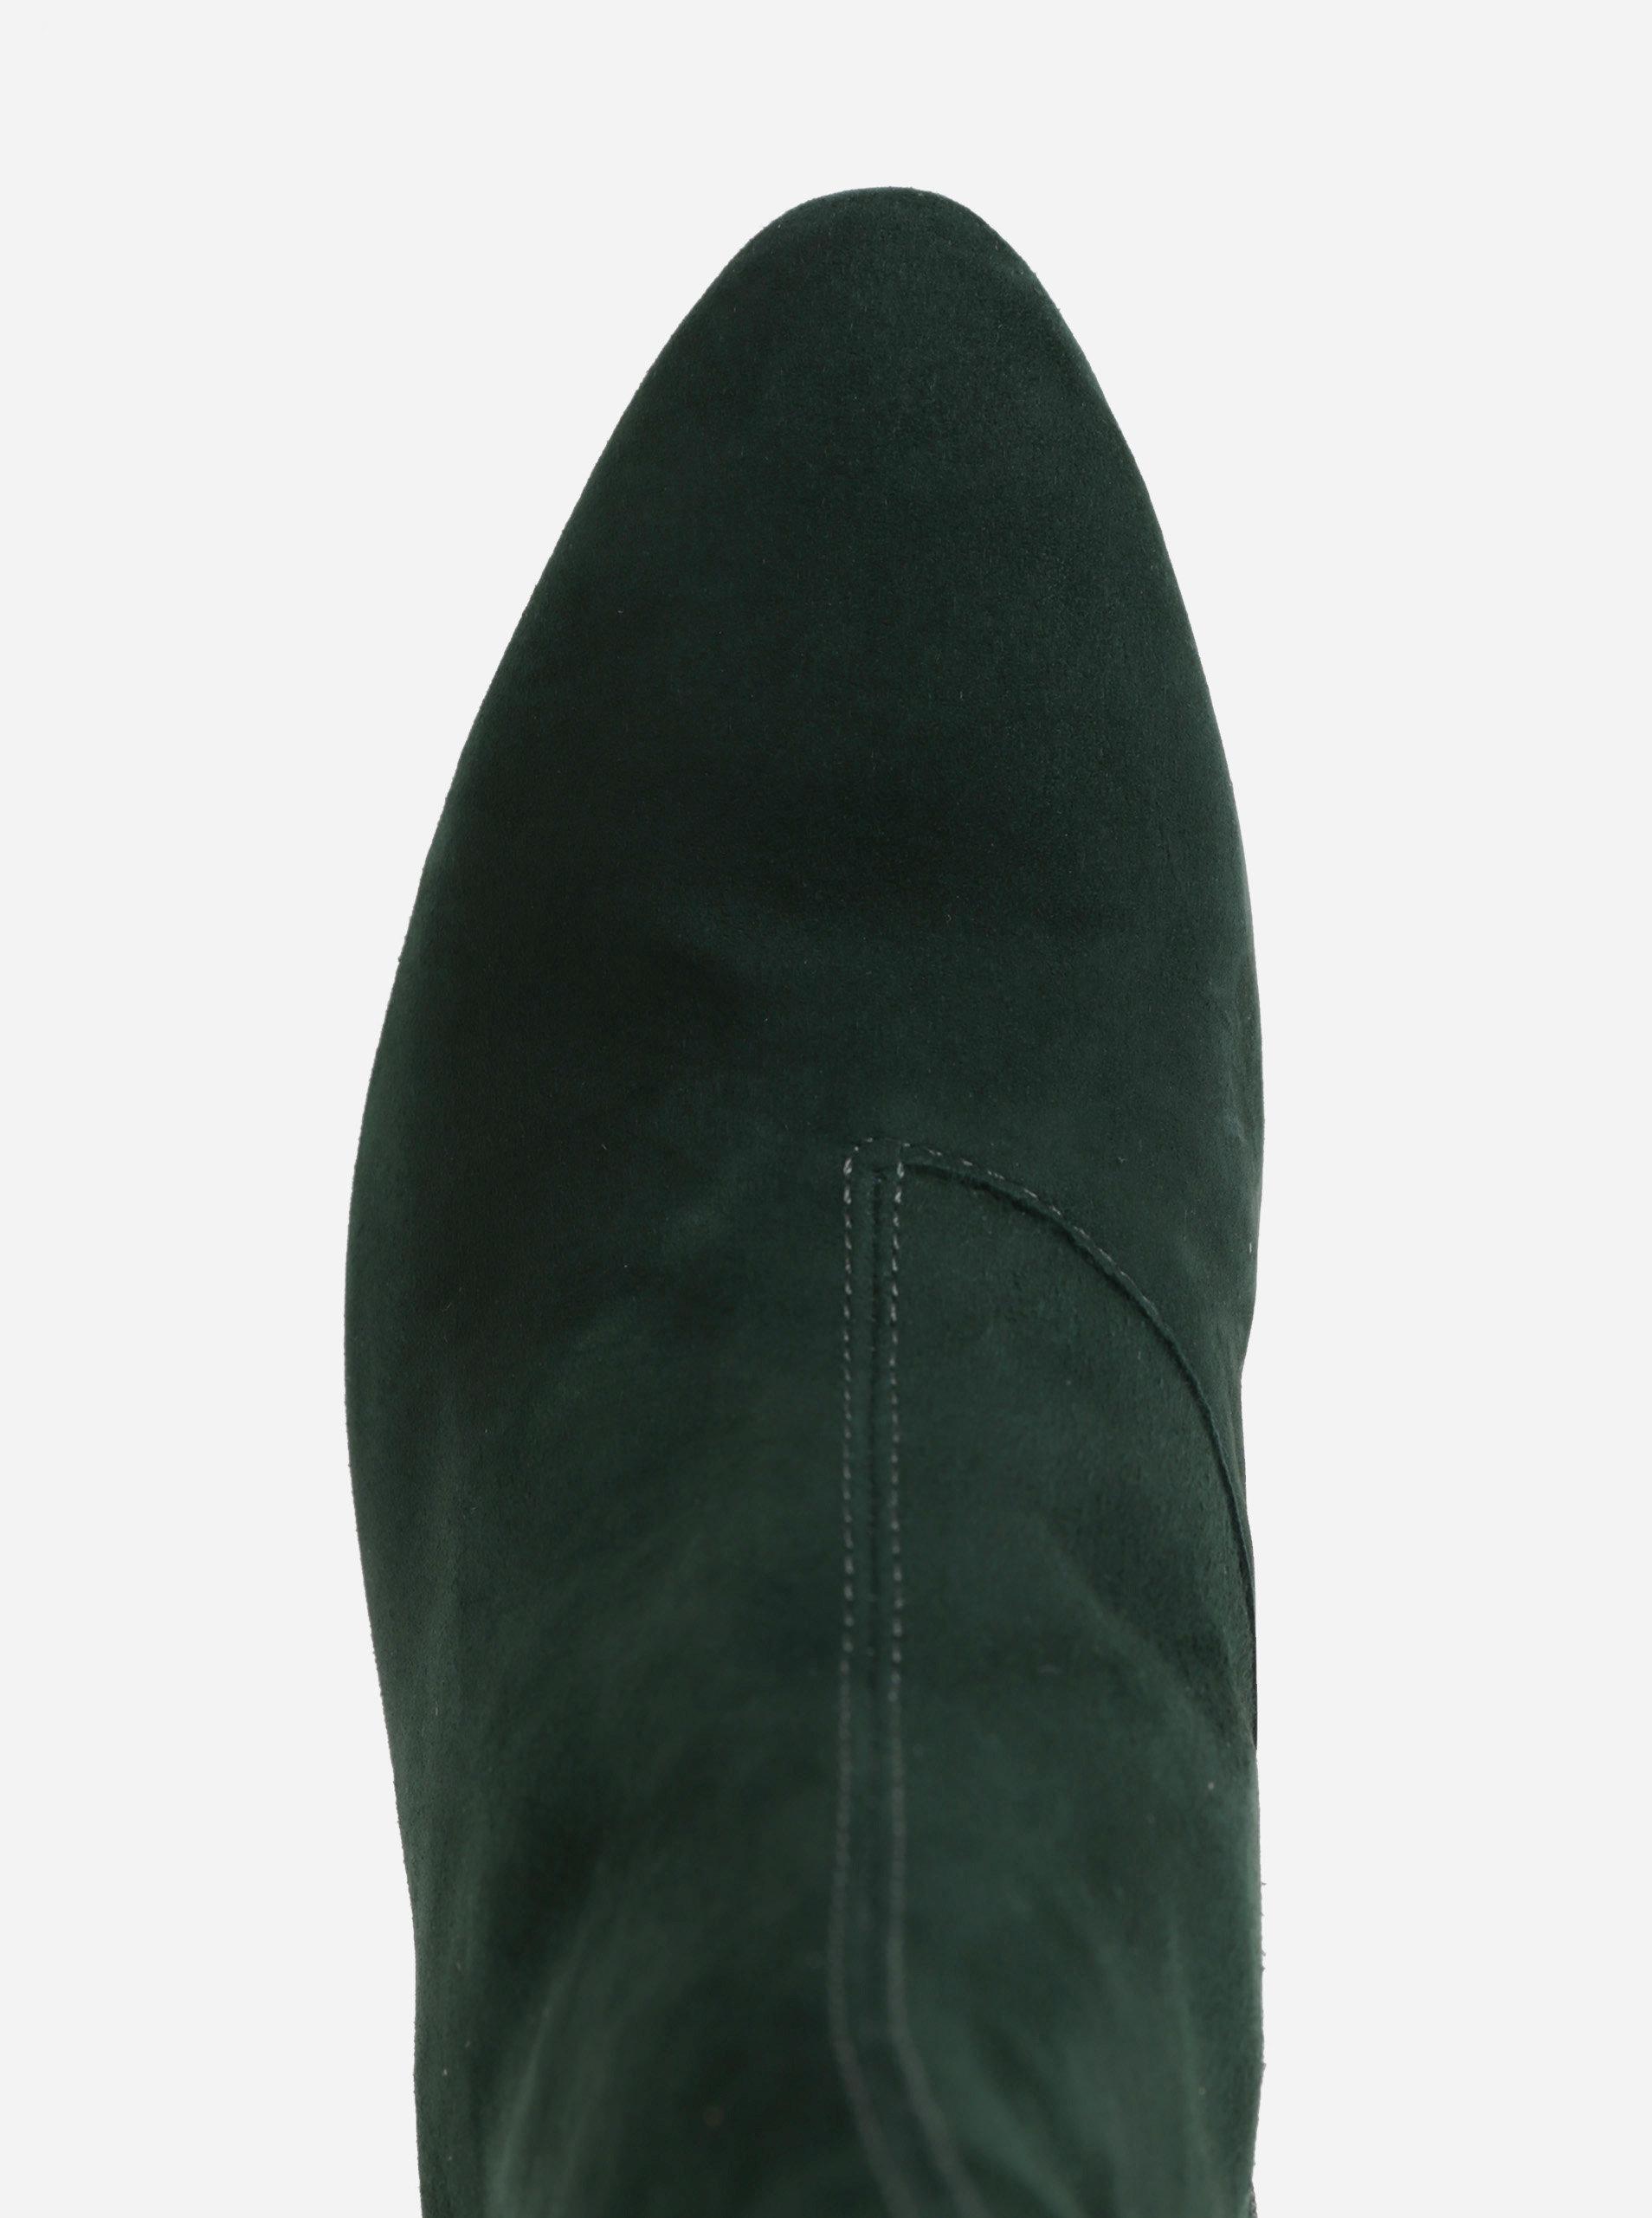 91e03bd8a5 Zelené dámske semišové členkové topánky Vagabond Olivia ...